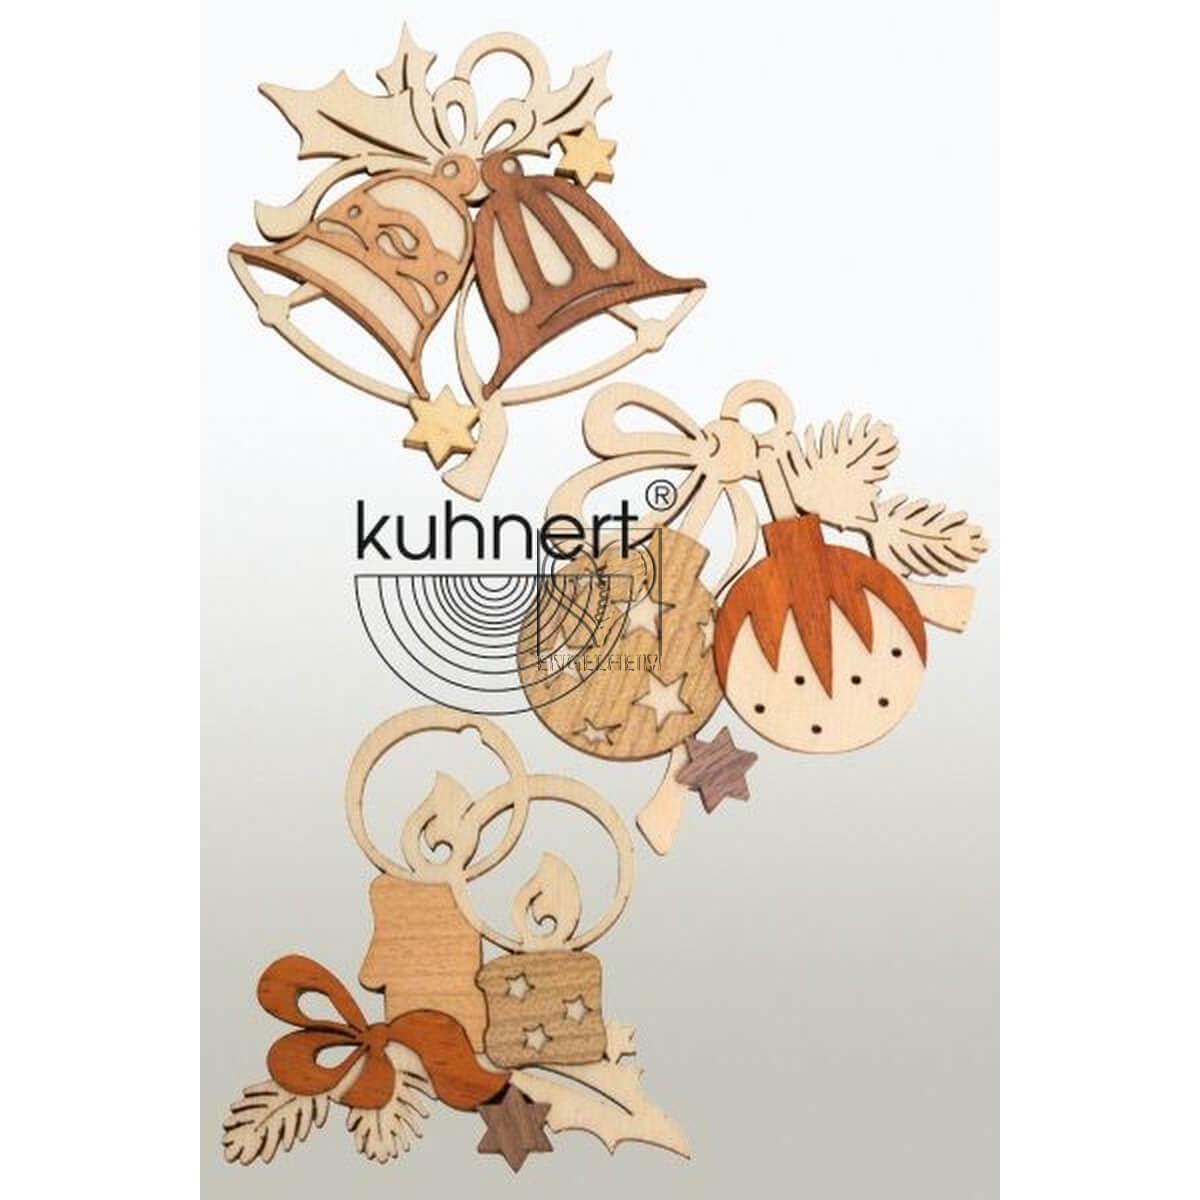 Baumschmuck-Set echt Erzgebirge Kuhnert 19094